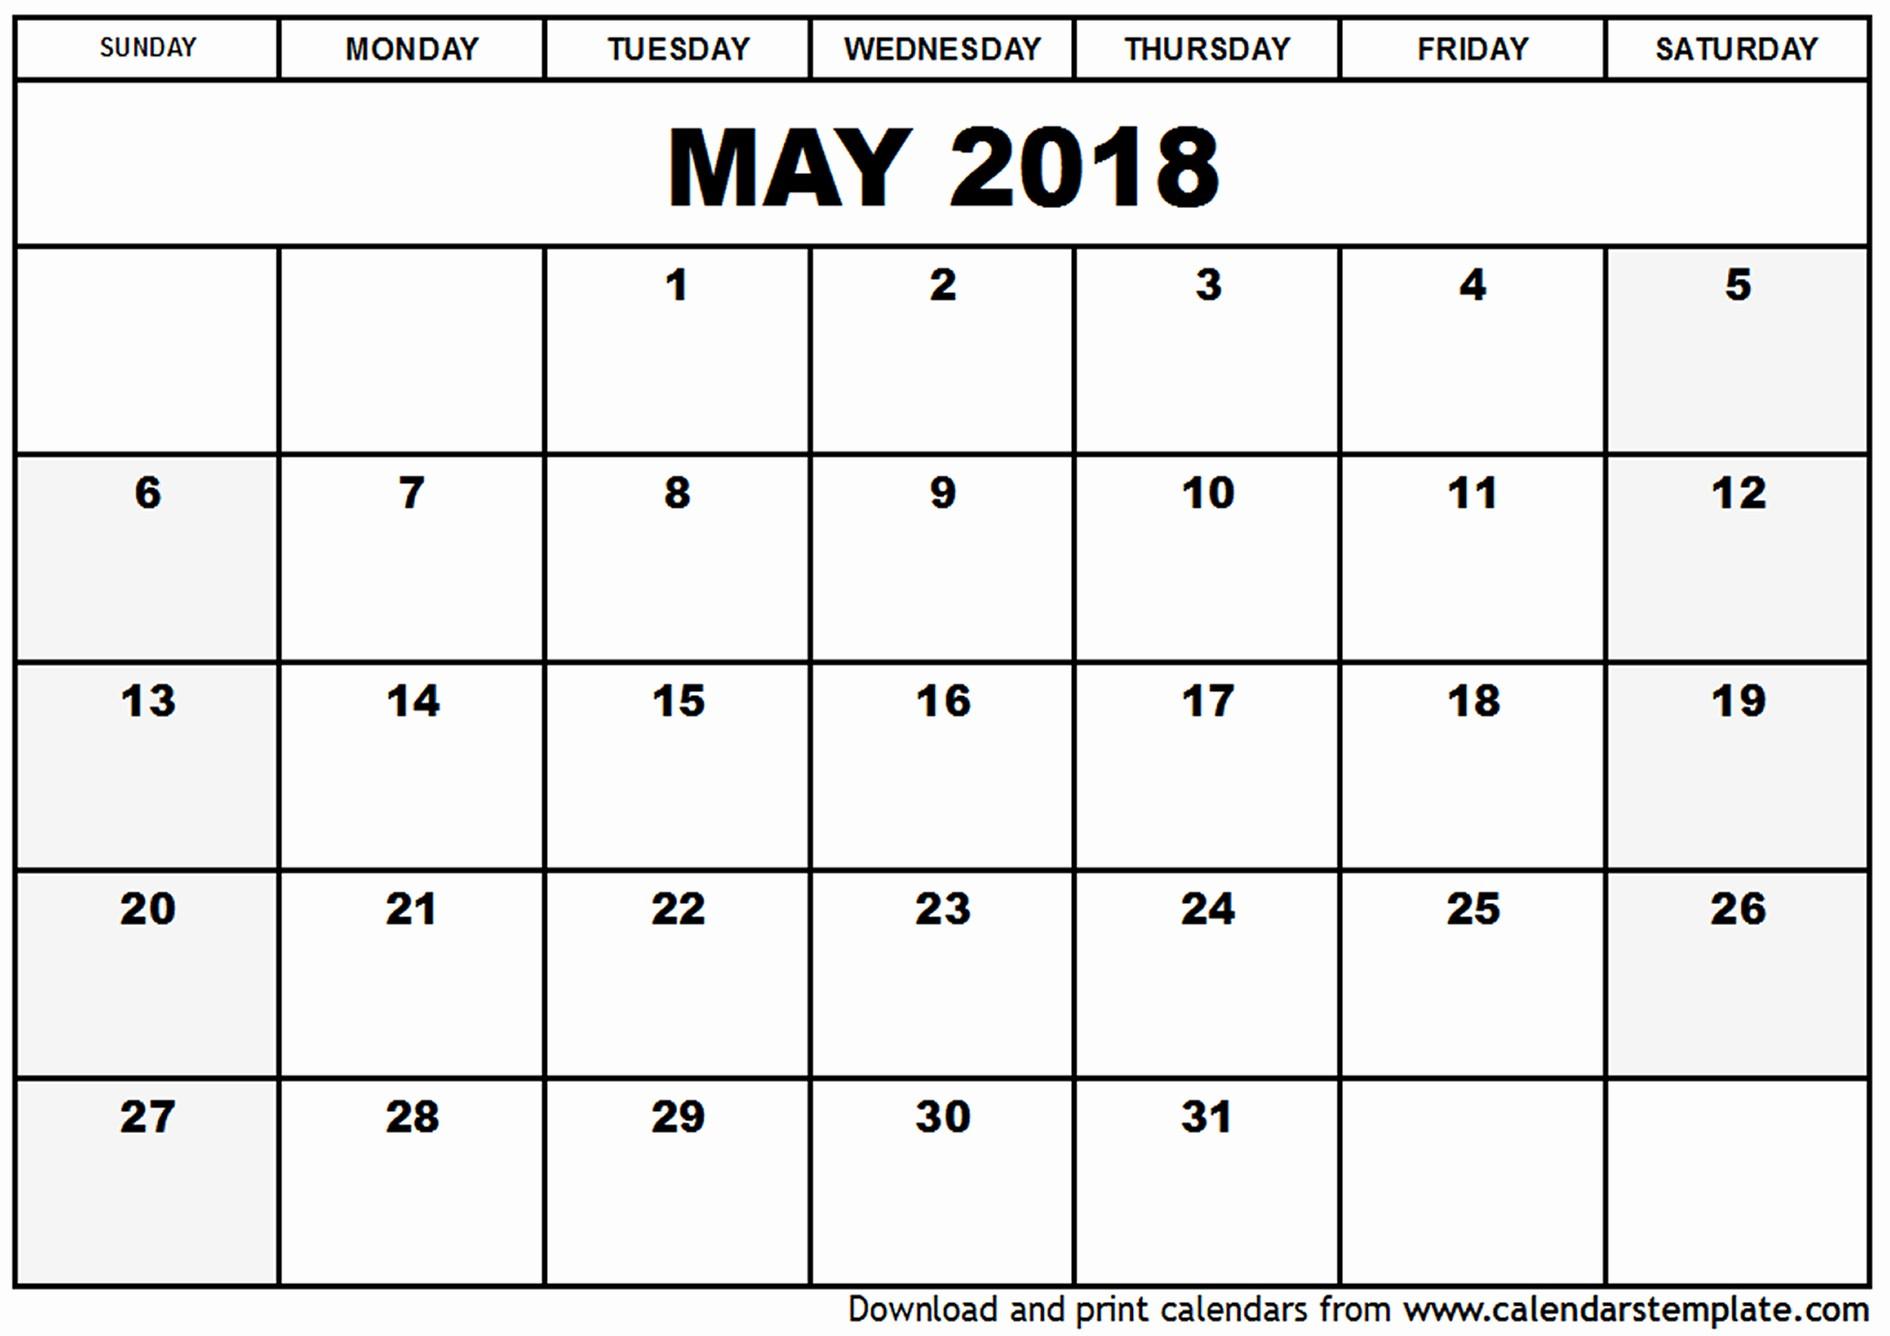 Free Printable 2018 Calendar Templates New May 2018 Calendar Template